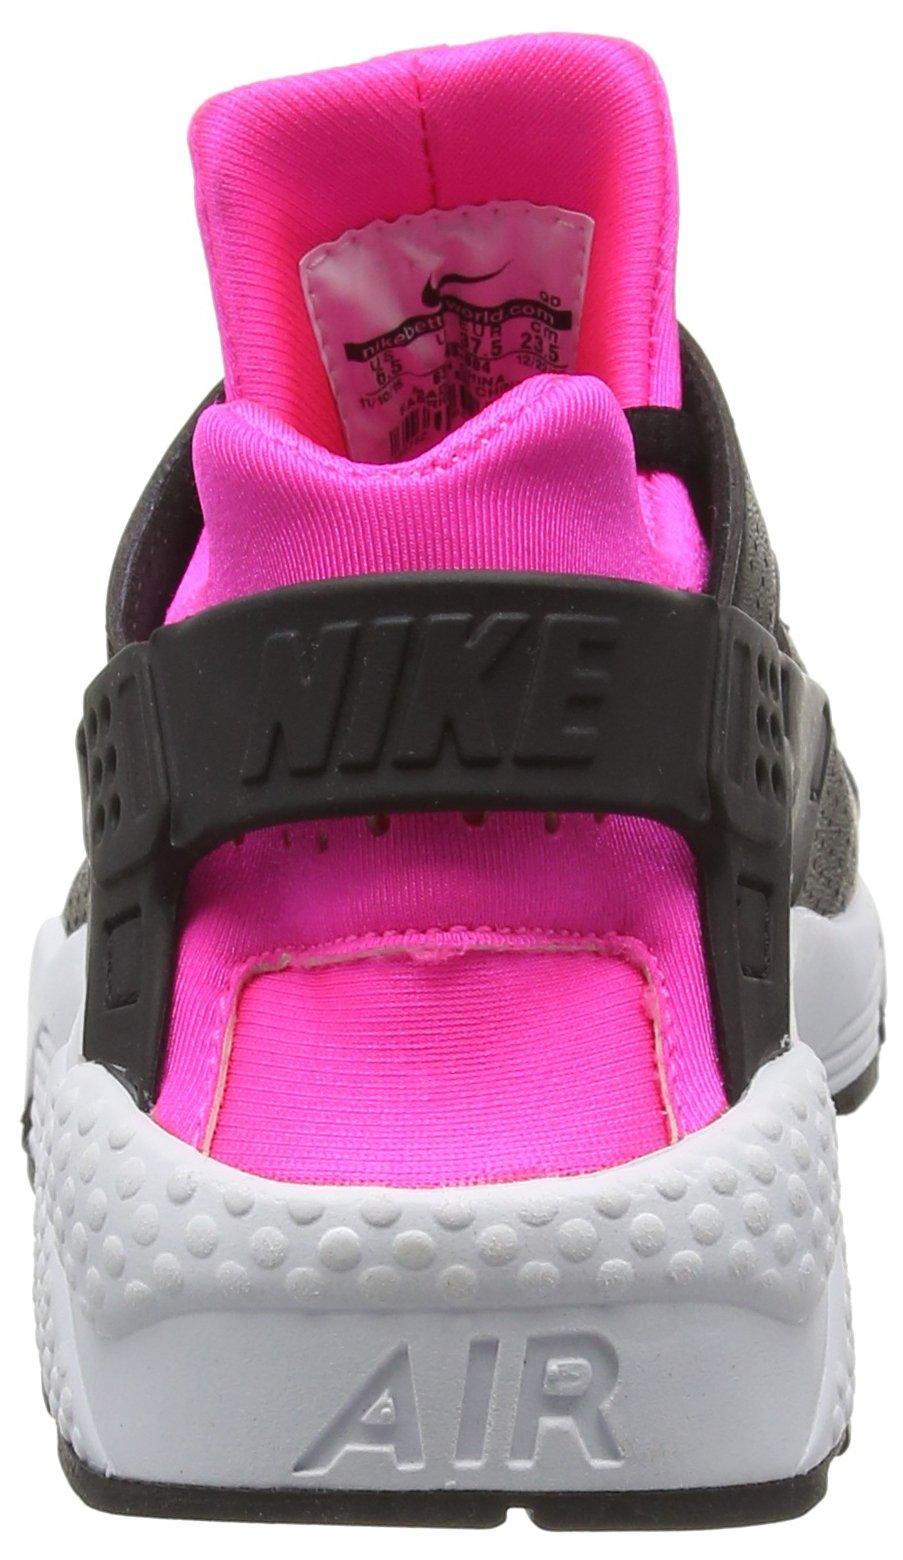 711VN31vHTL - Nike Women's Wmns Air Huarache Running Shoes